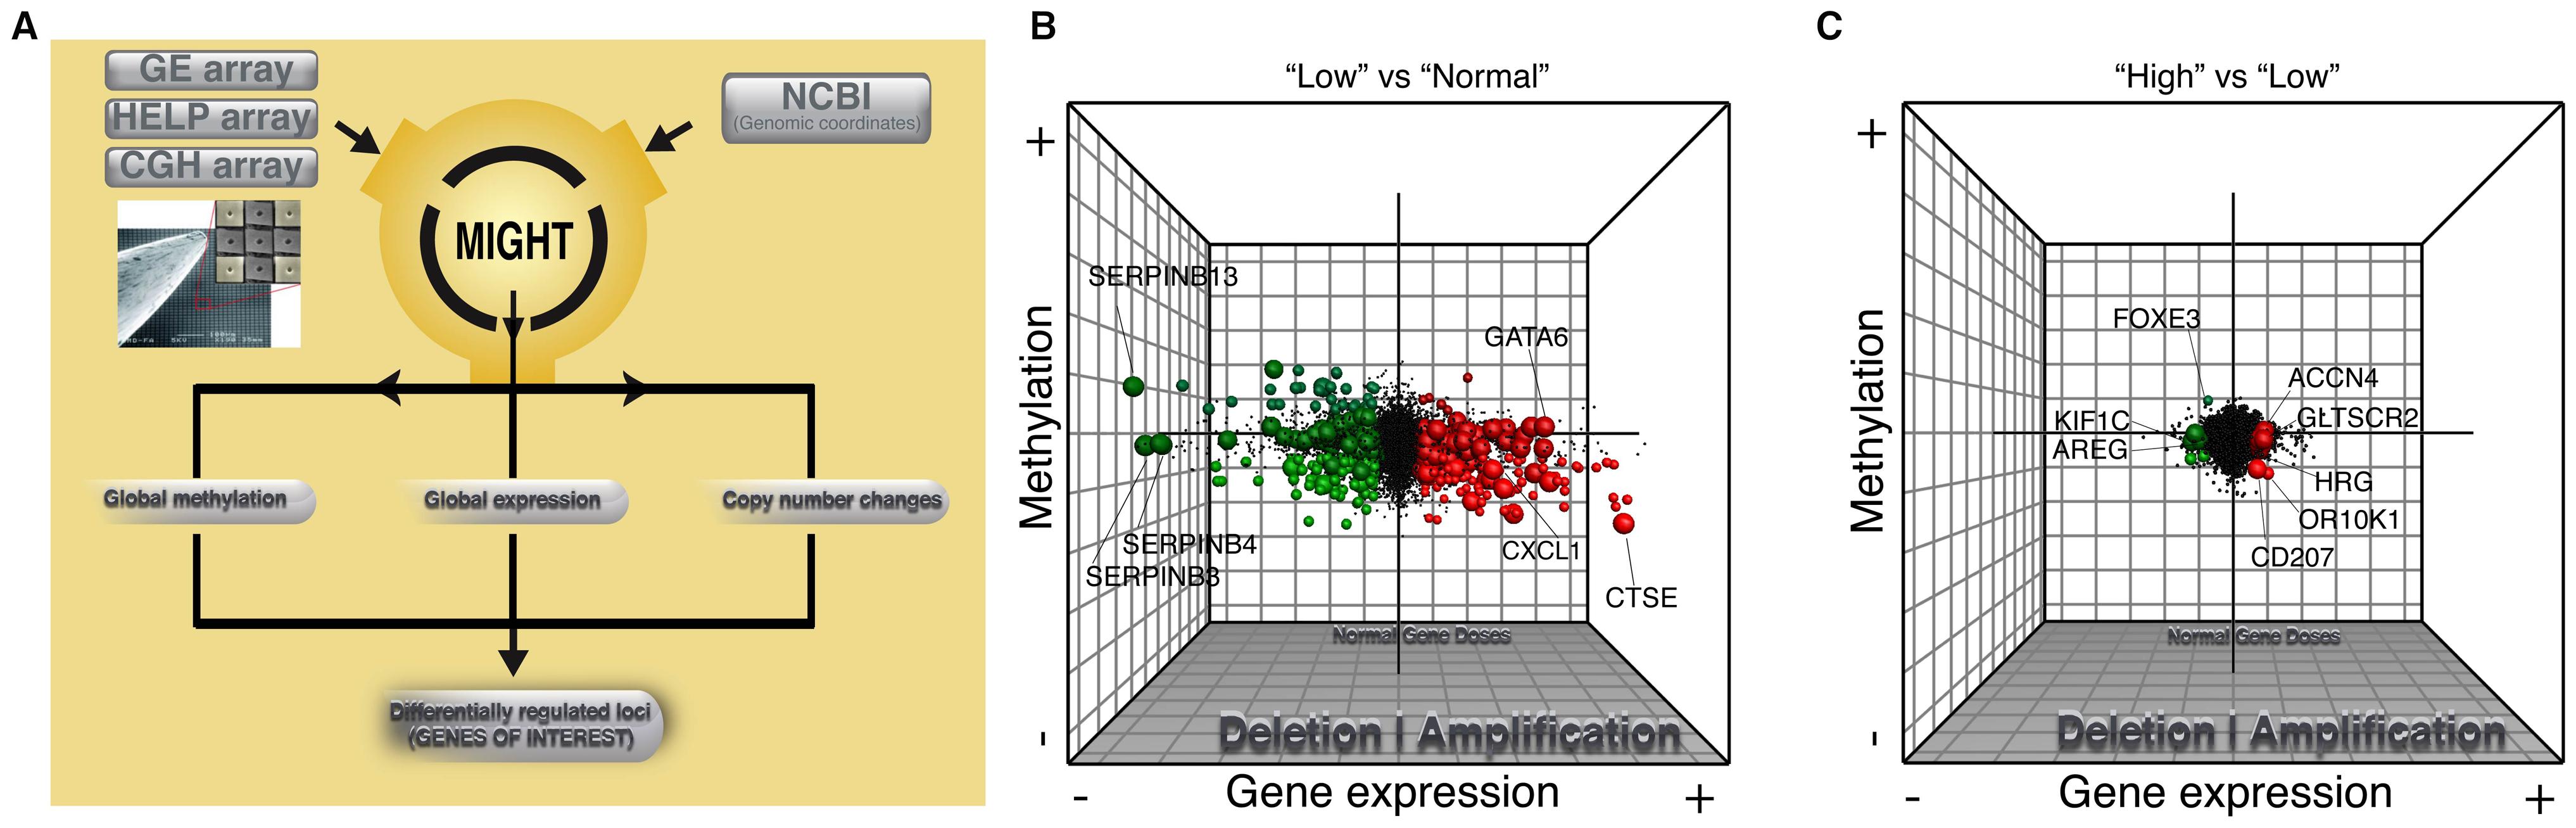 Global integrative analysis of transcriptomic, epigenomic, and DNA copy number data.